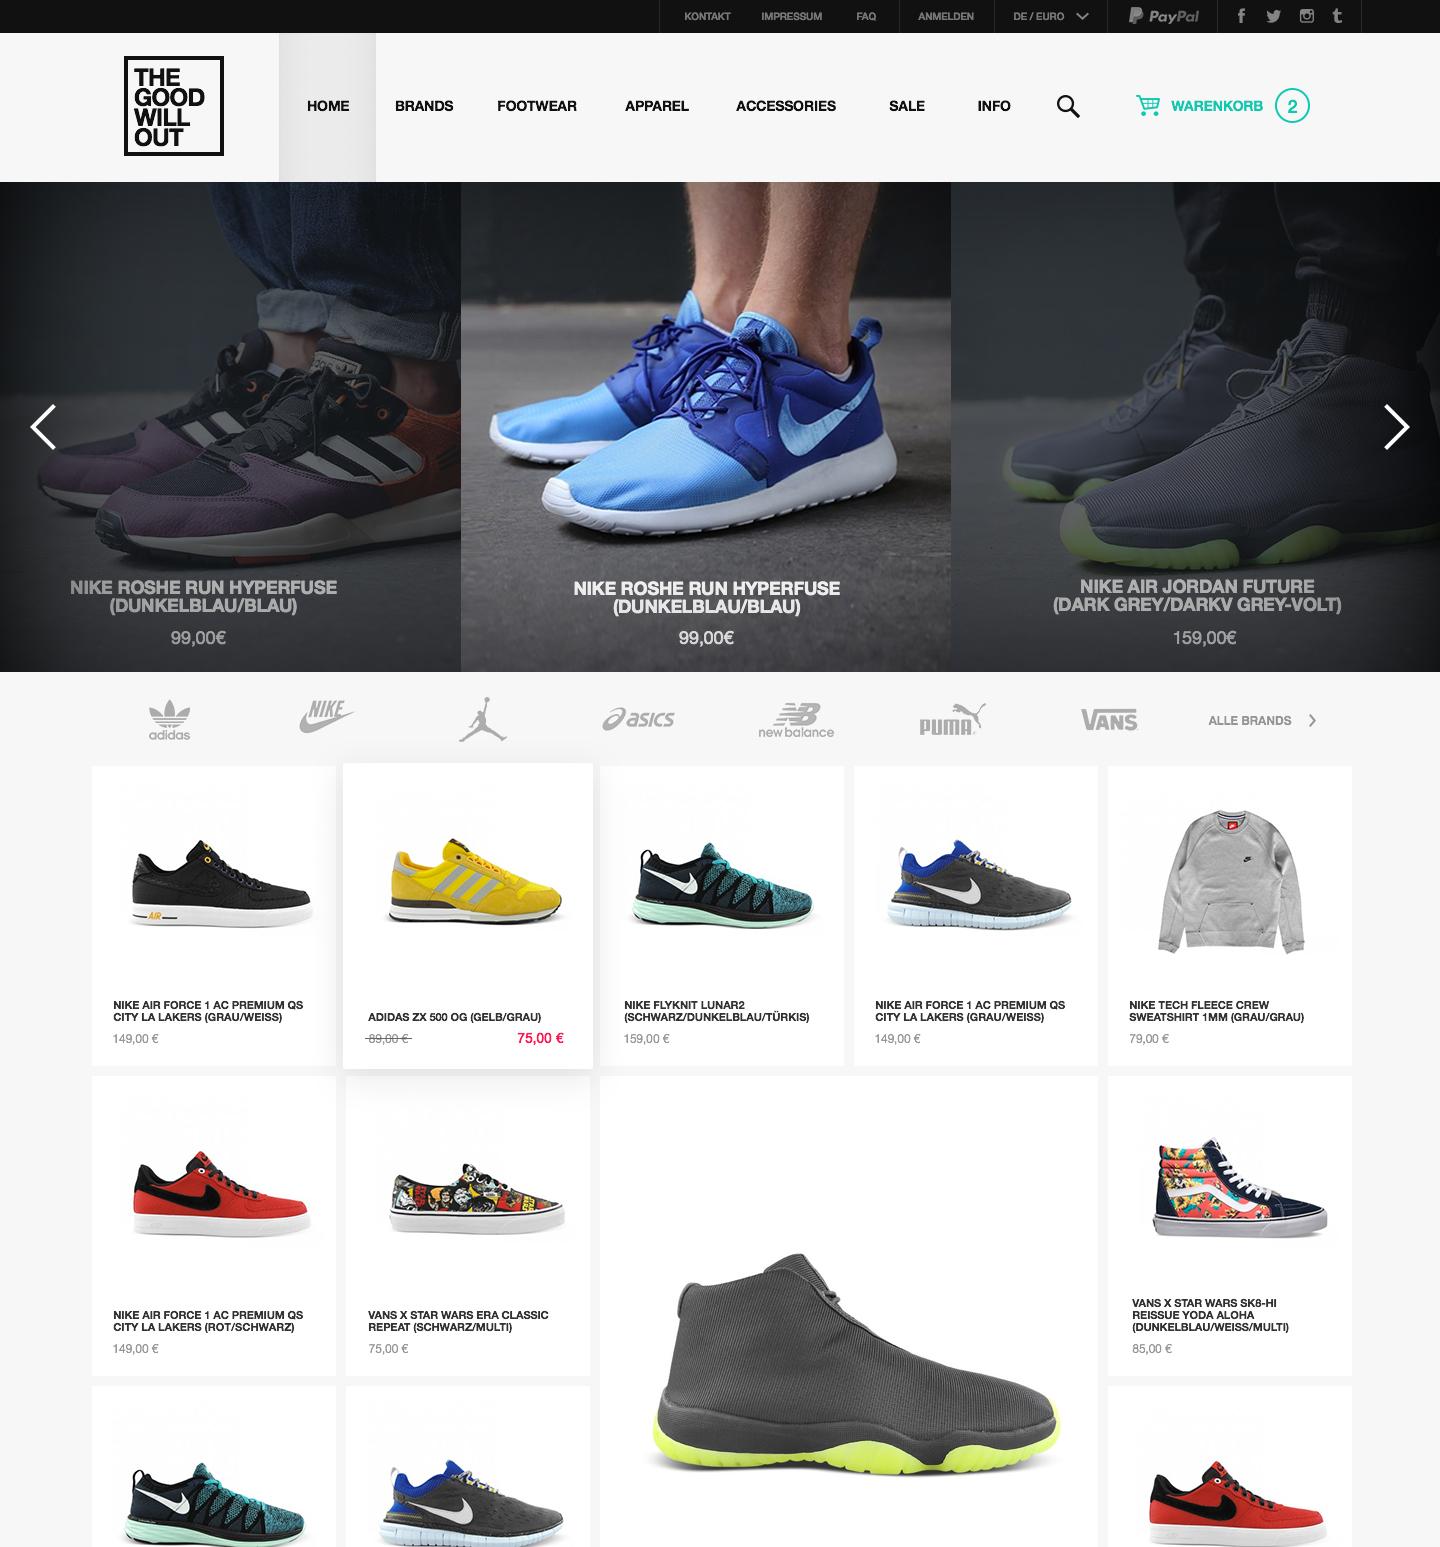 Интернет-магазин обуви THE GOOD WILL OUT (г. Кёльн, Германия)